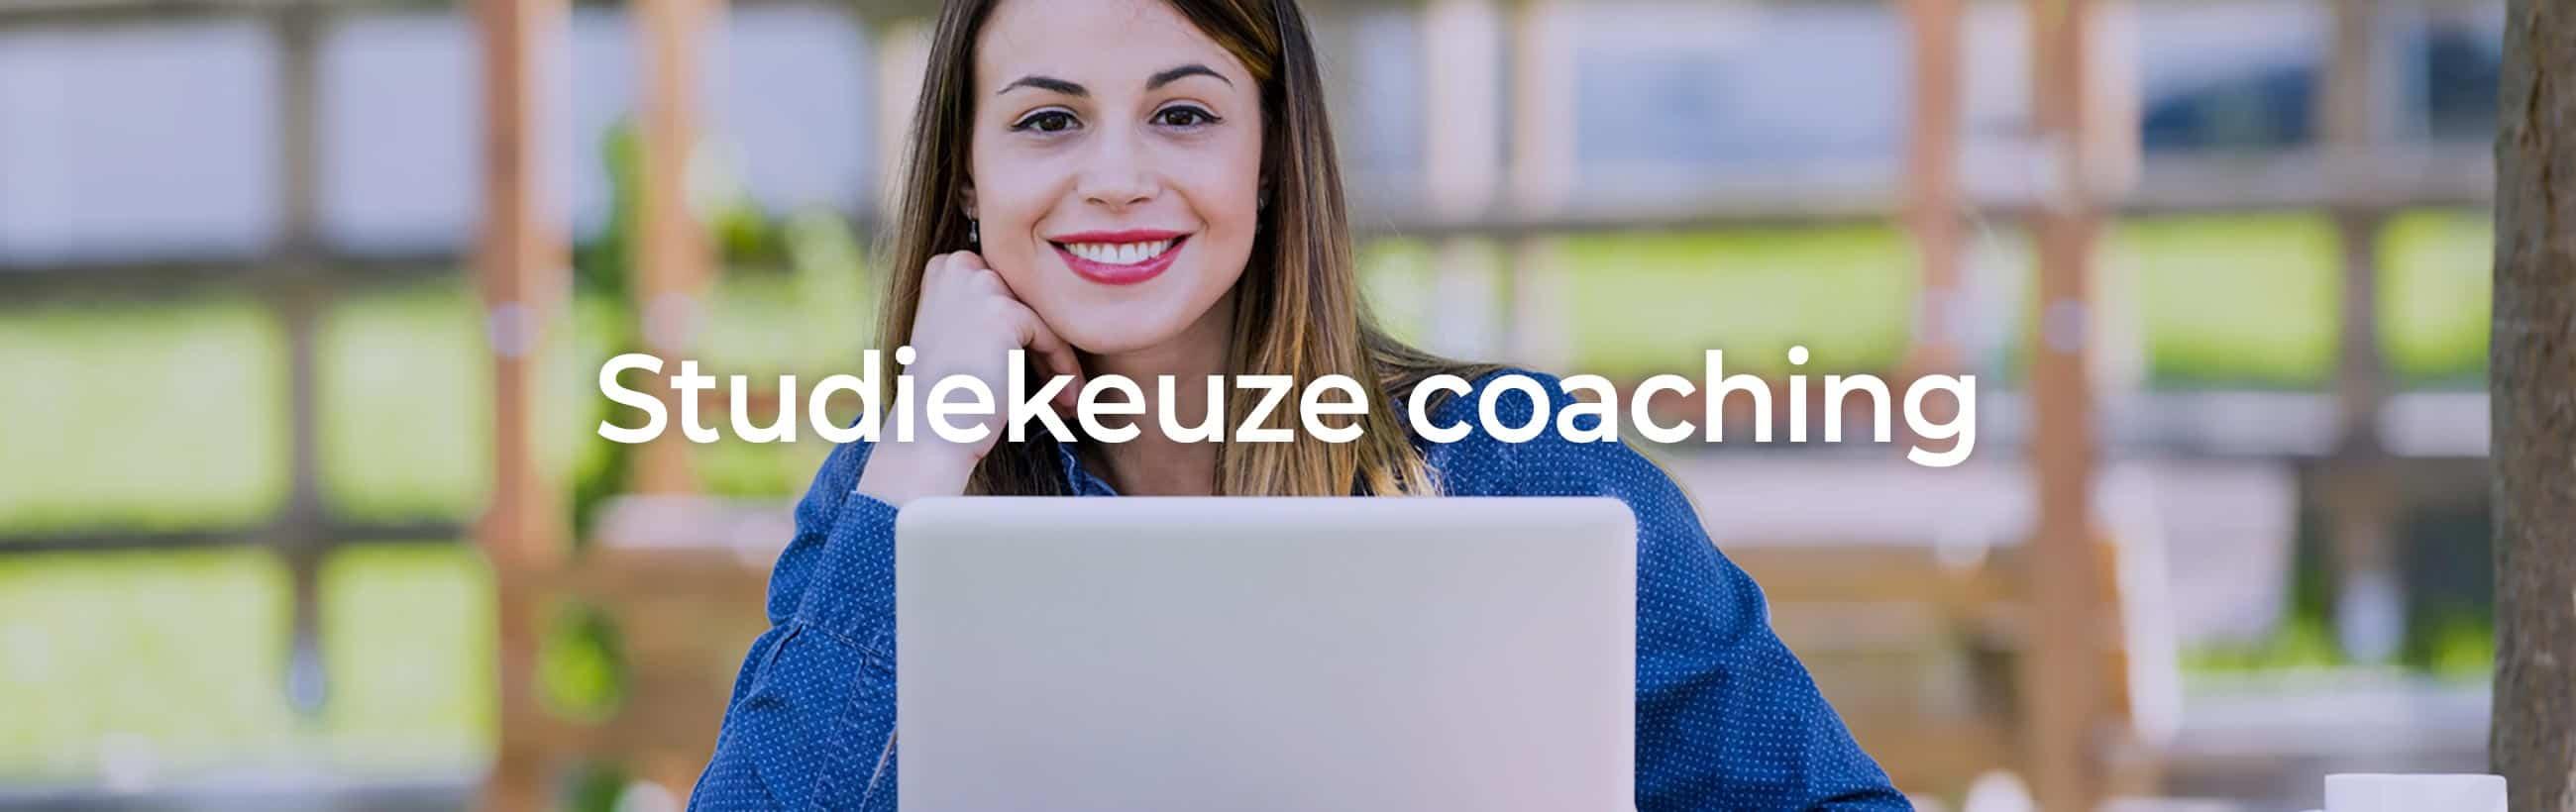 Studiekeuze coaching - Blueberry Hill